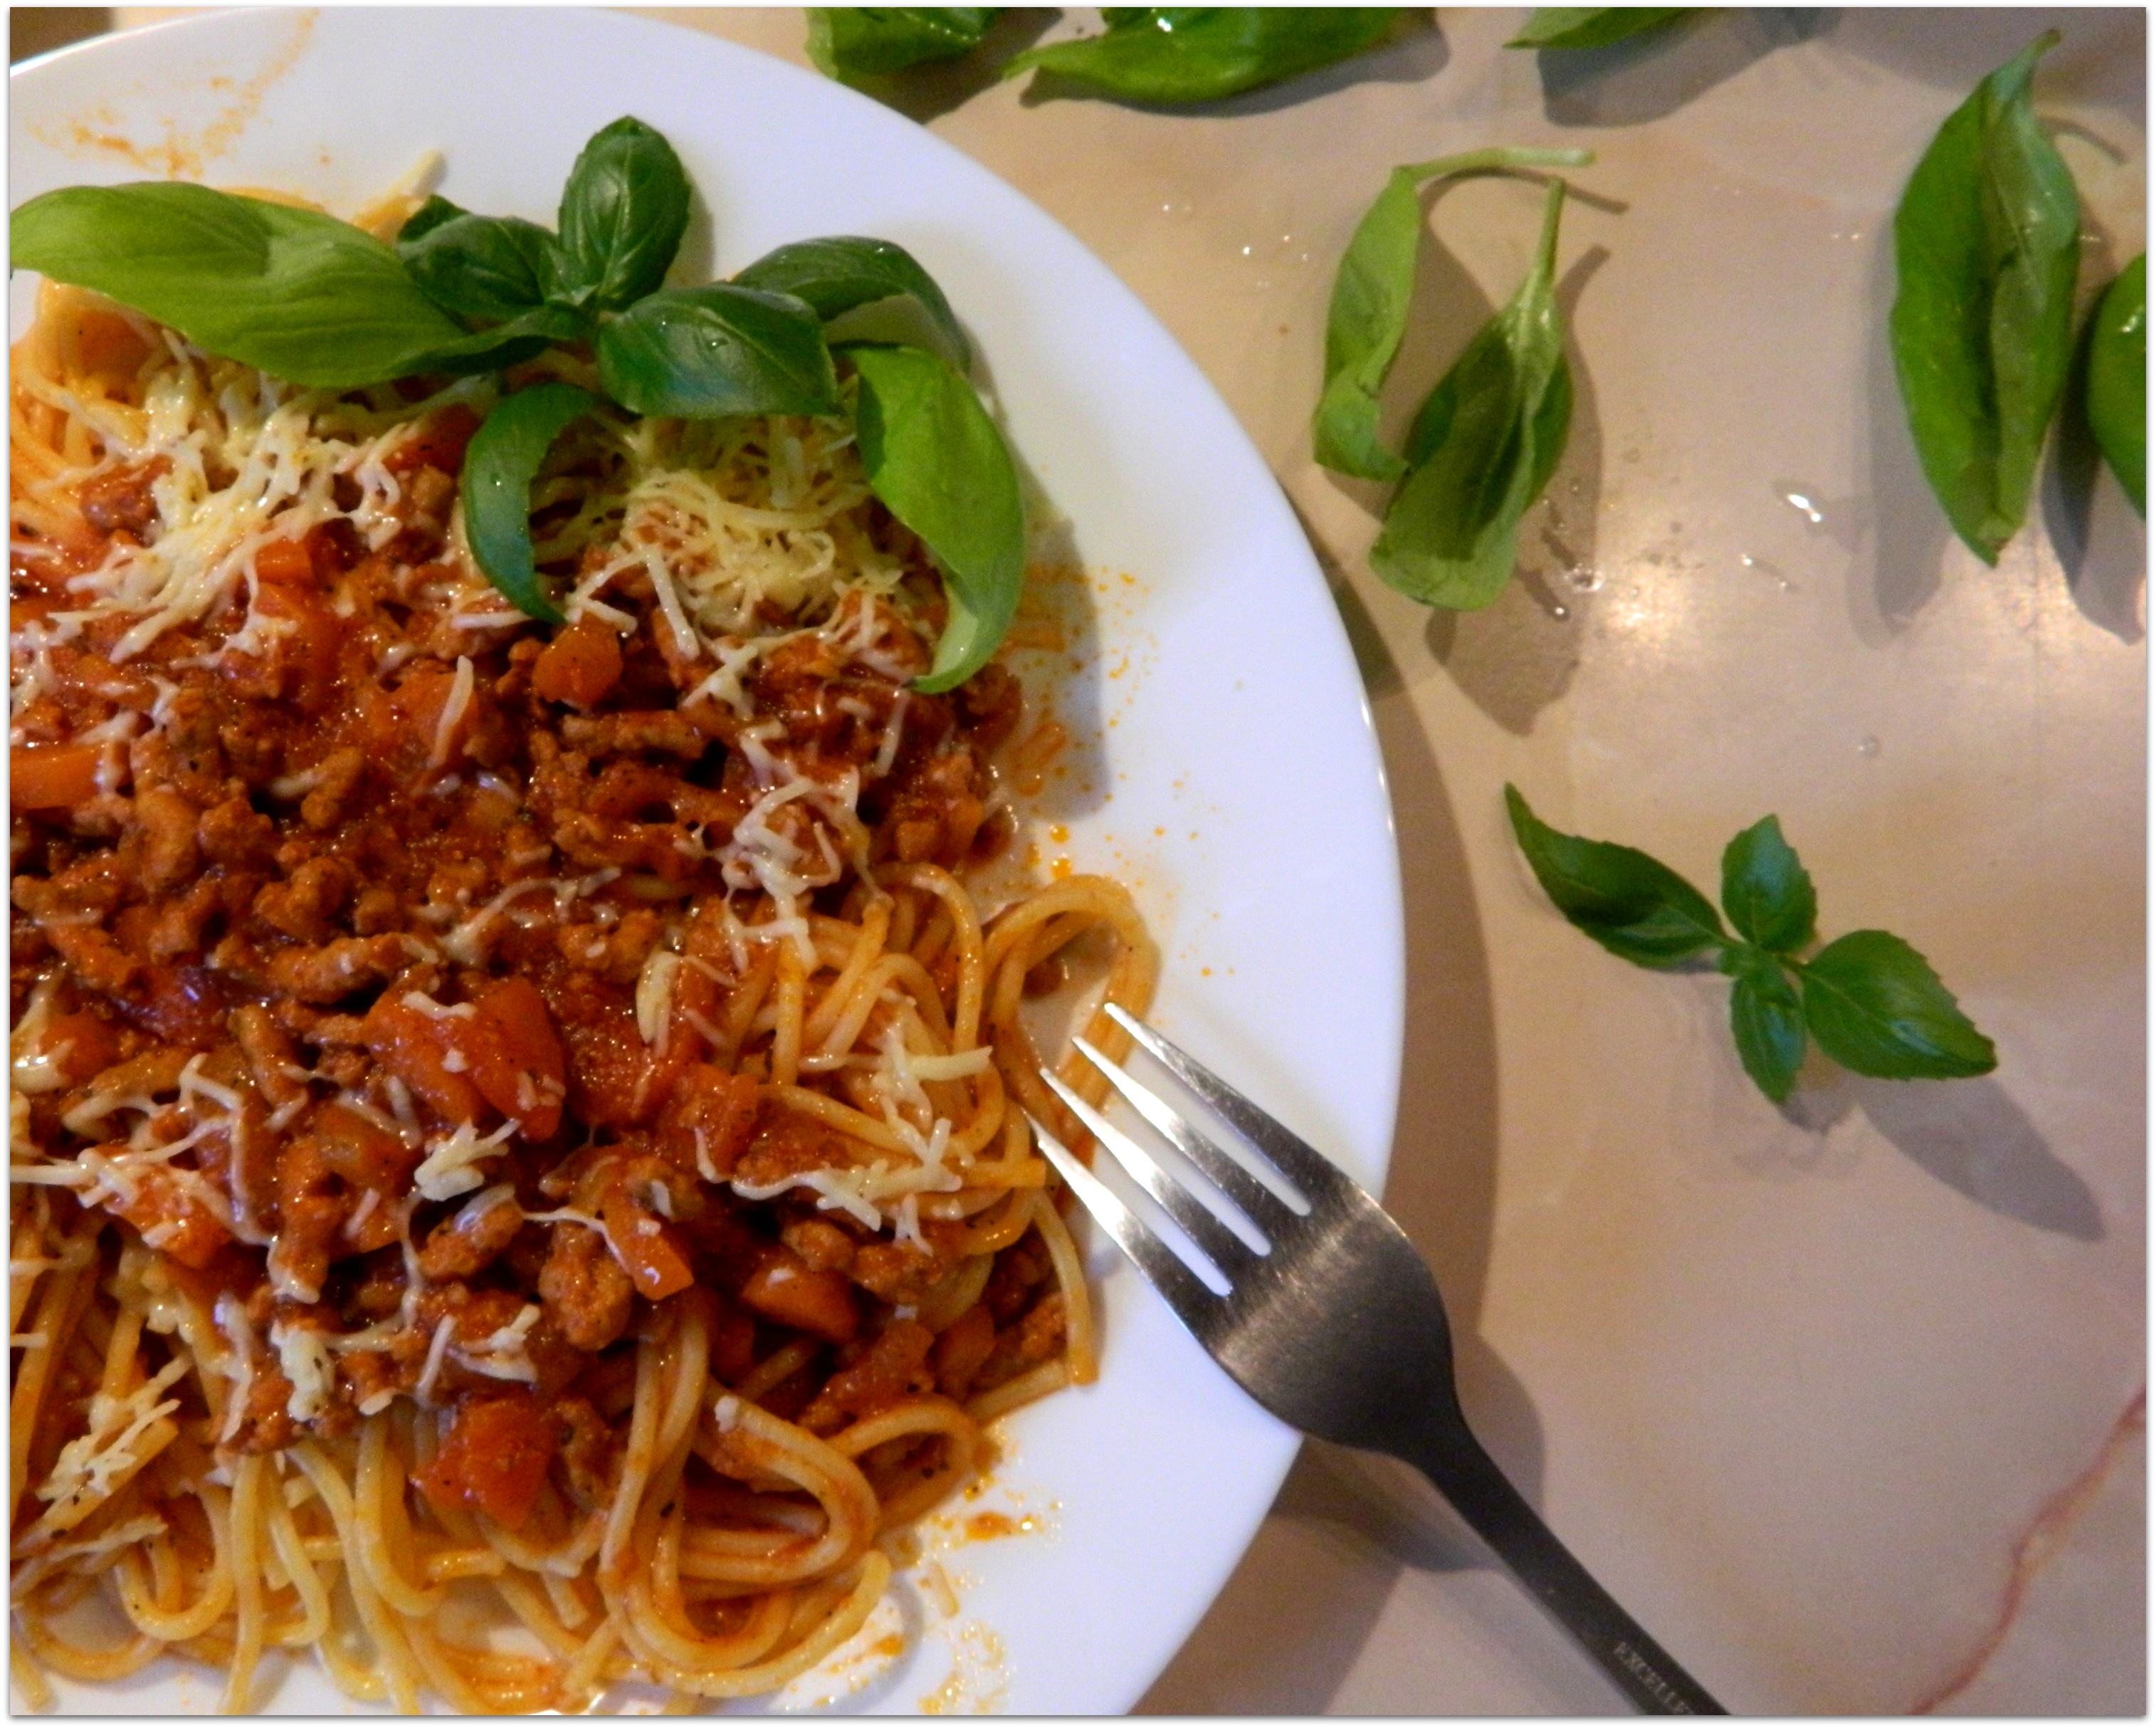 Zróbmy sobie spaghetti